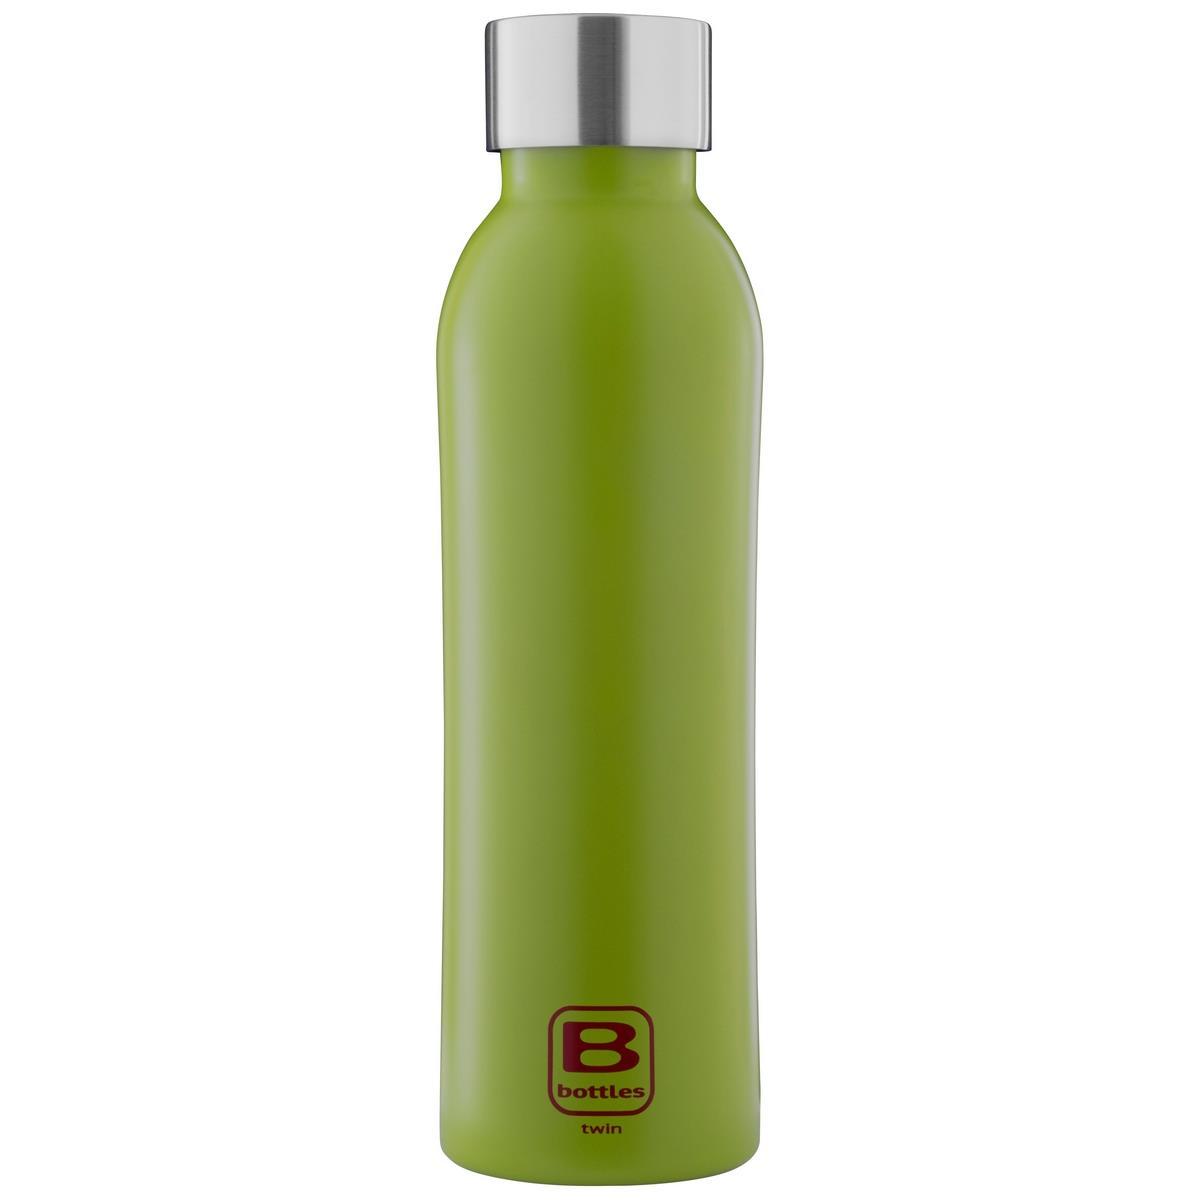 B Bottles Twin - Verde Lime - 500 ml - Bottiglia Termica a doppia parete in acciaio inox 18/10